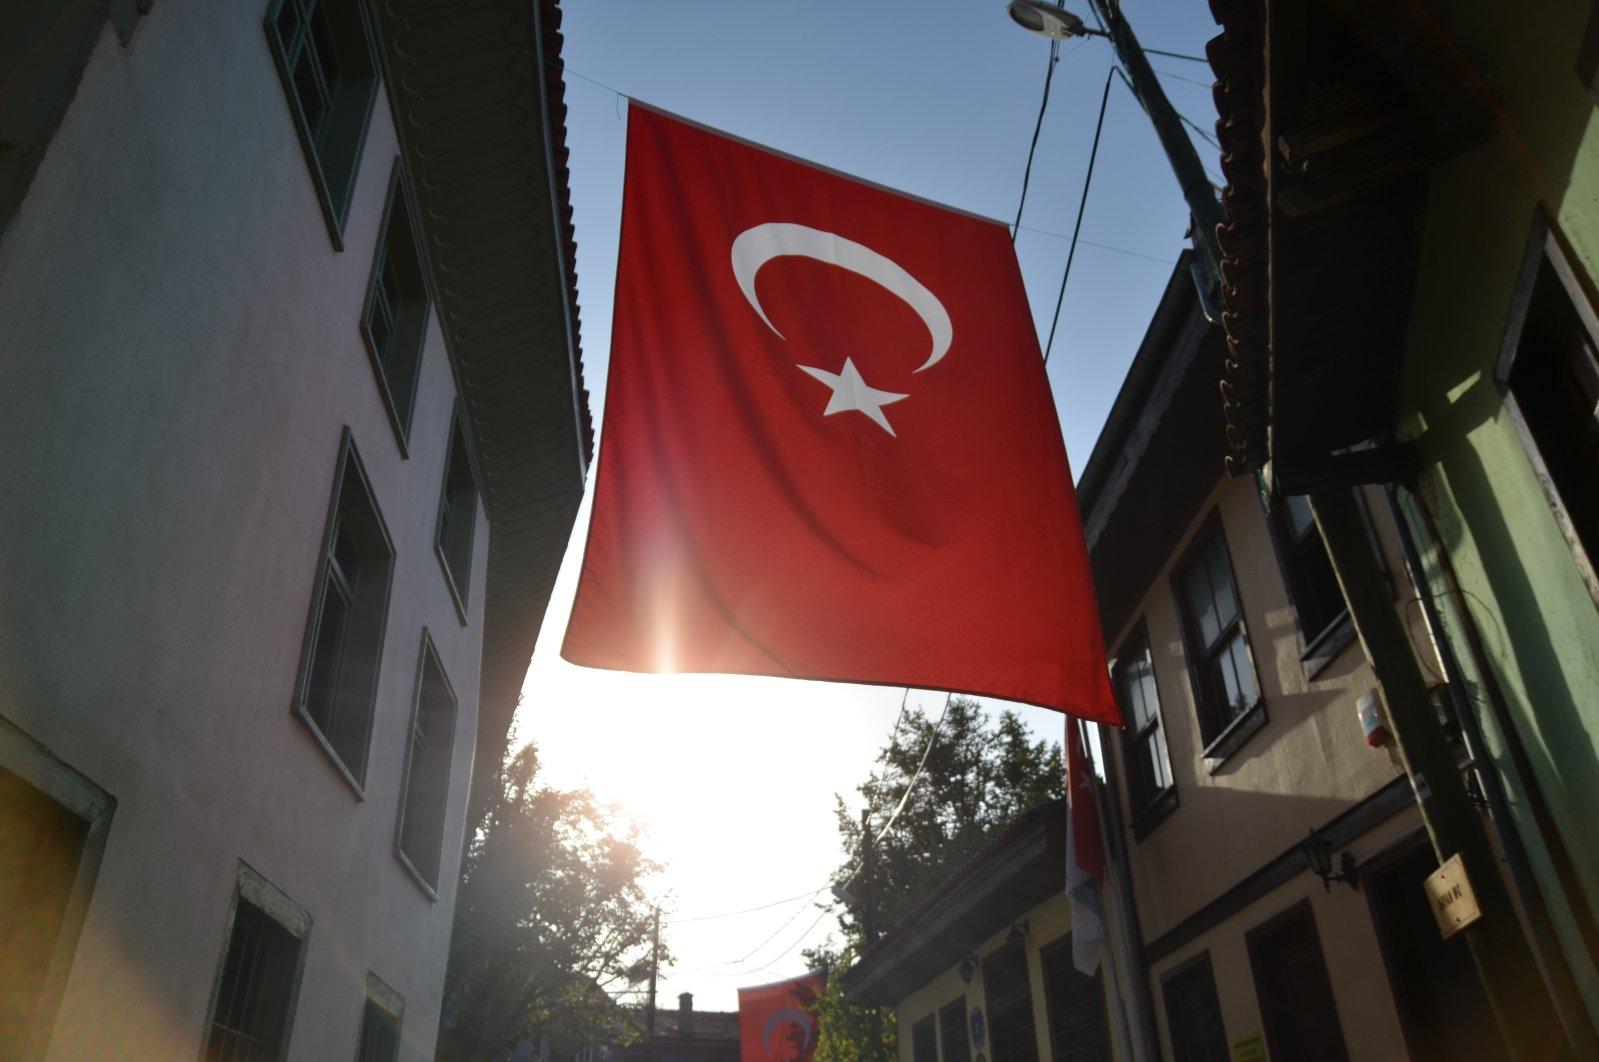 Turkish flag hangs between two buildings. (Shutterstock Photo)